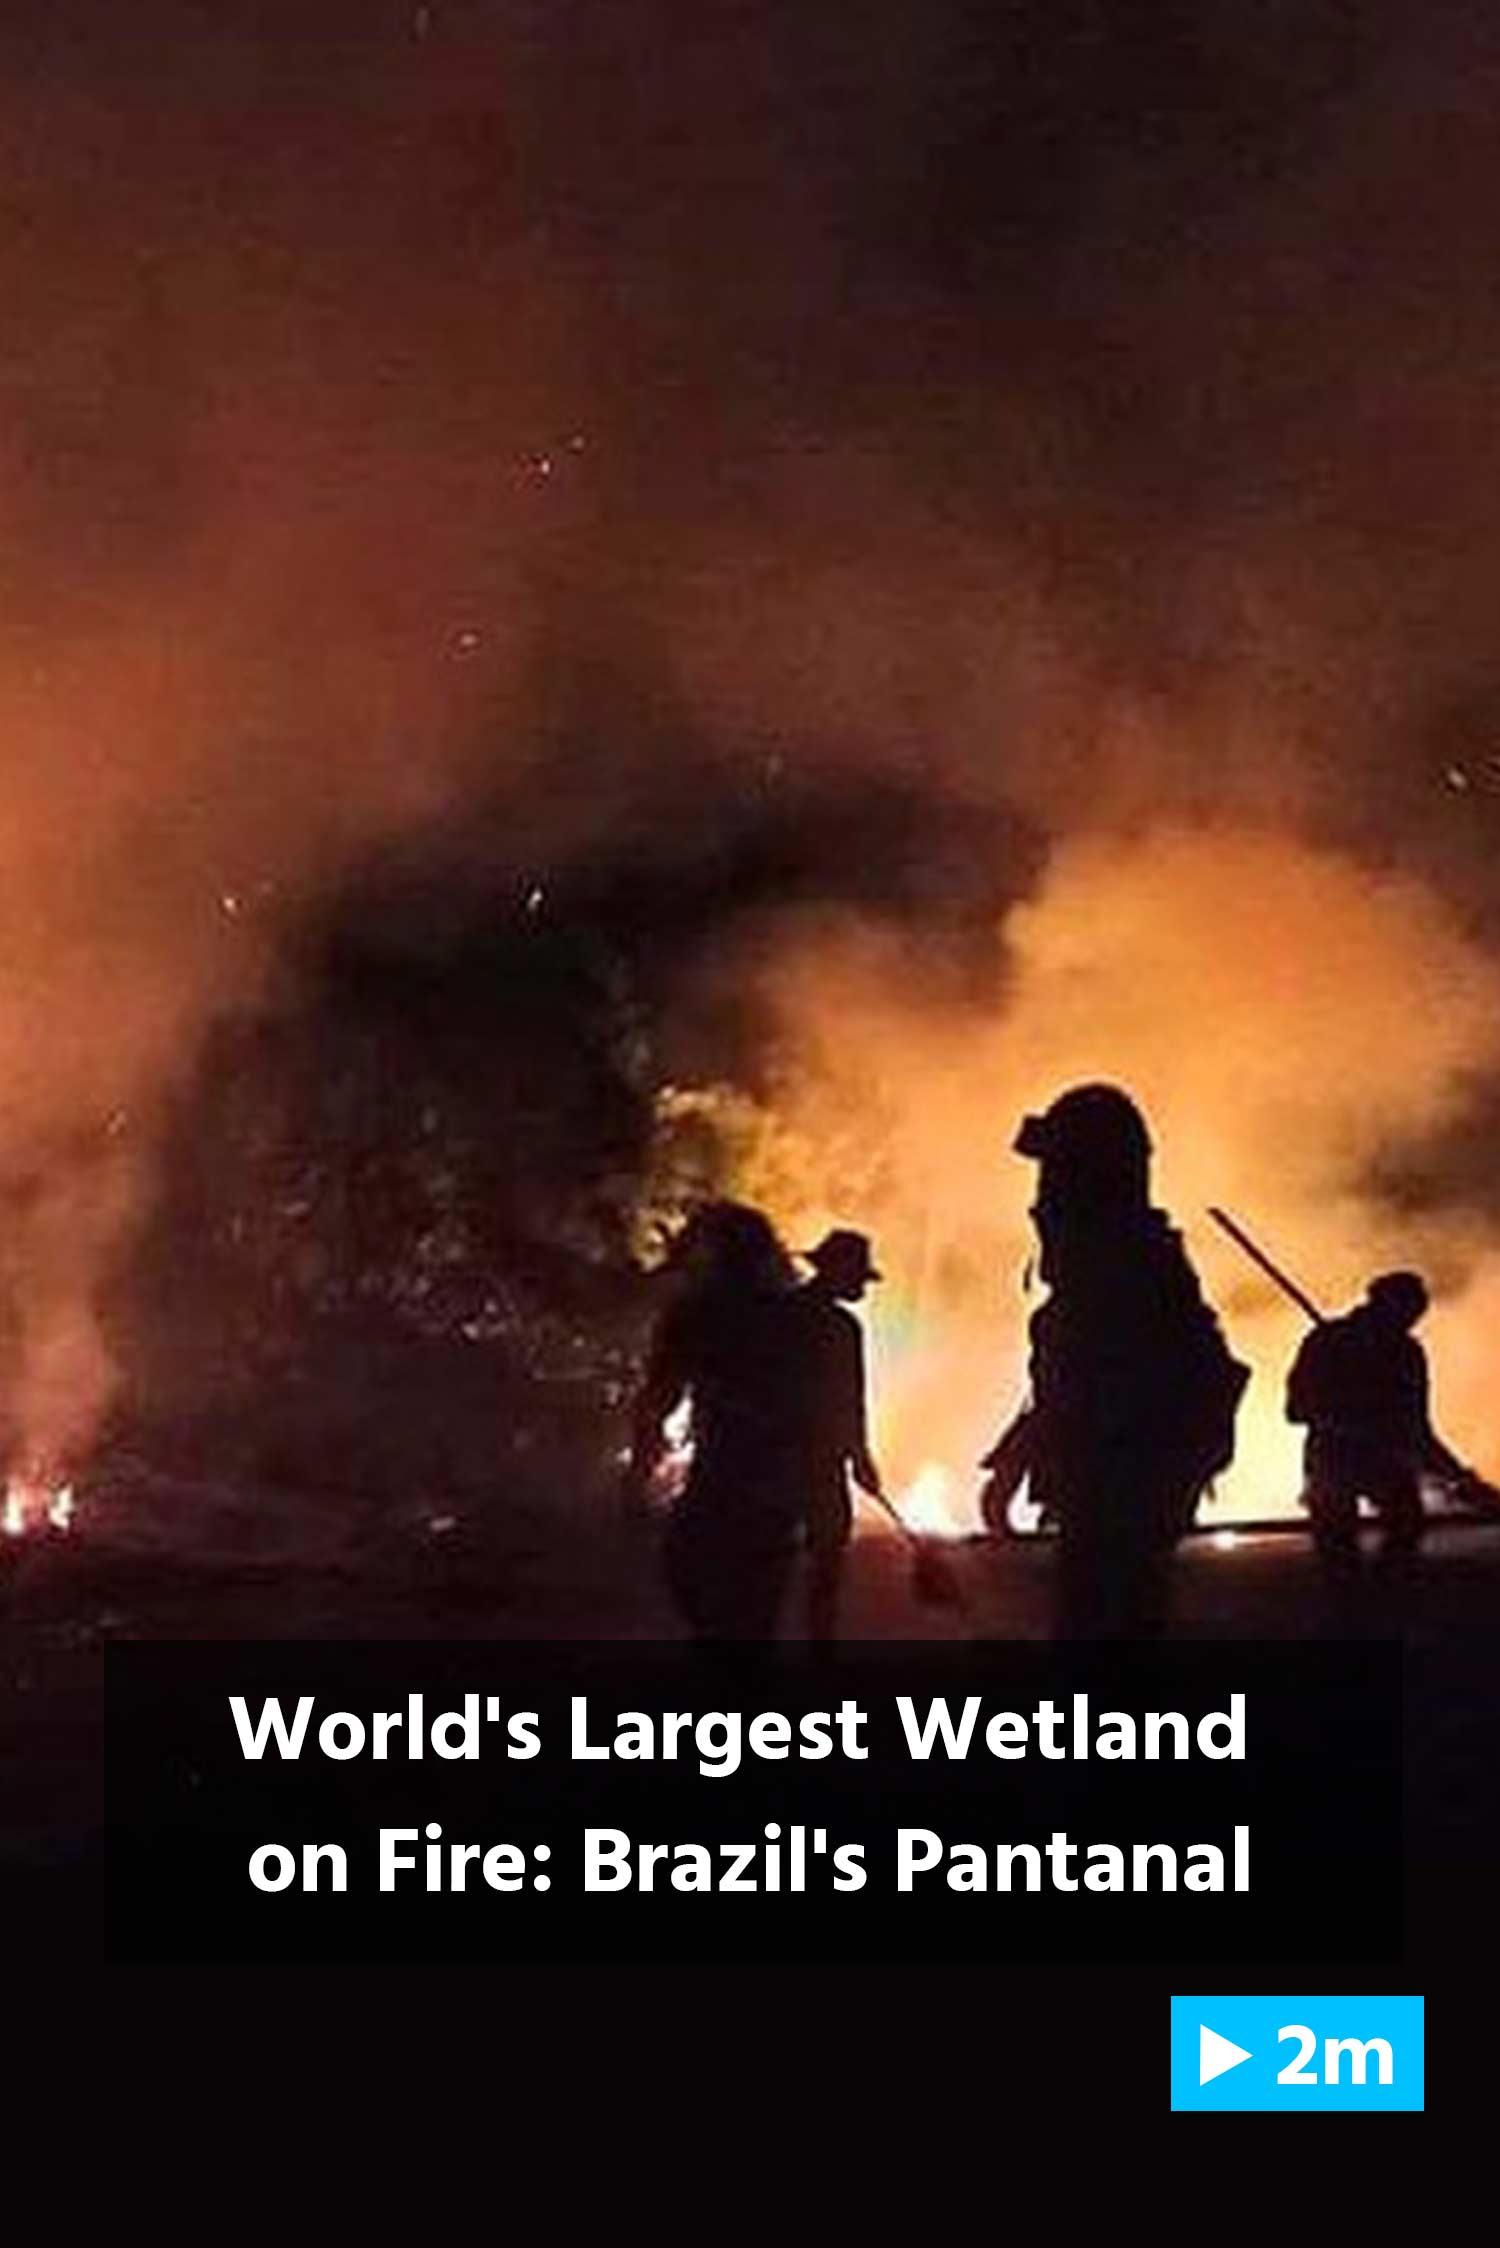 Reuter's Report: World's largest wetland on fire: Brazil's Pantanal